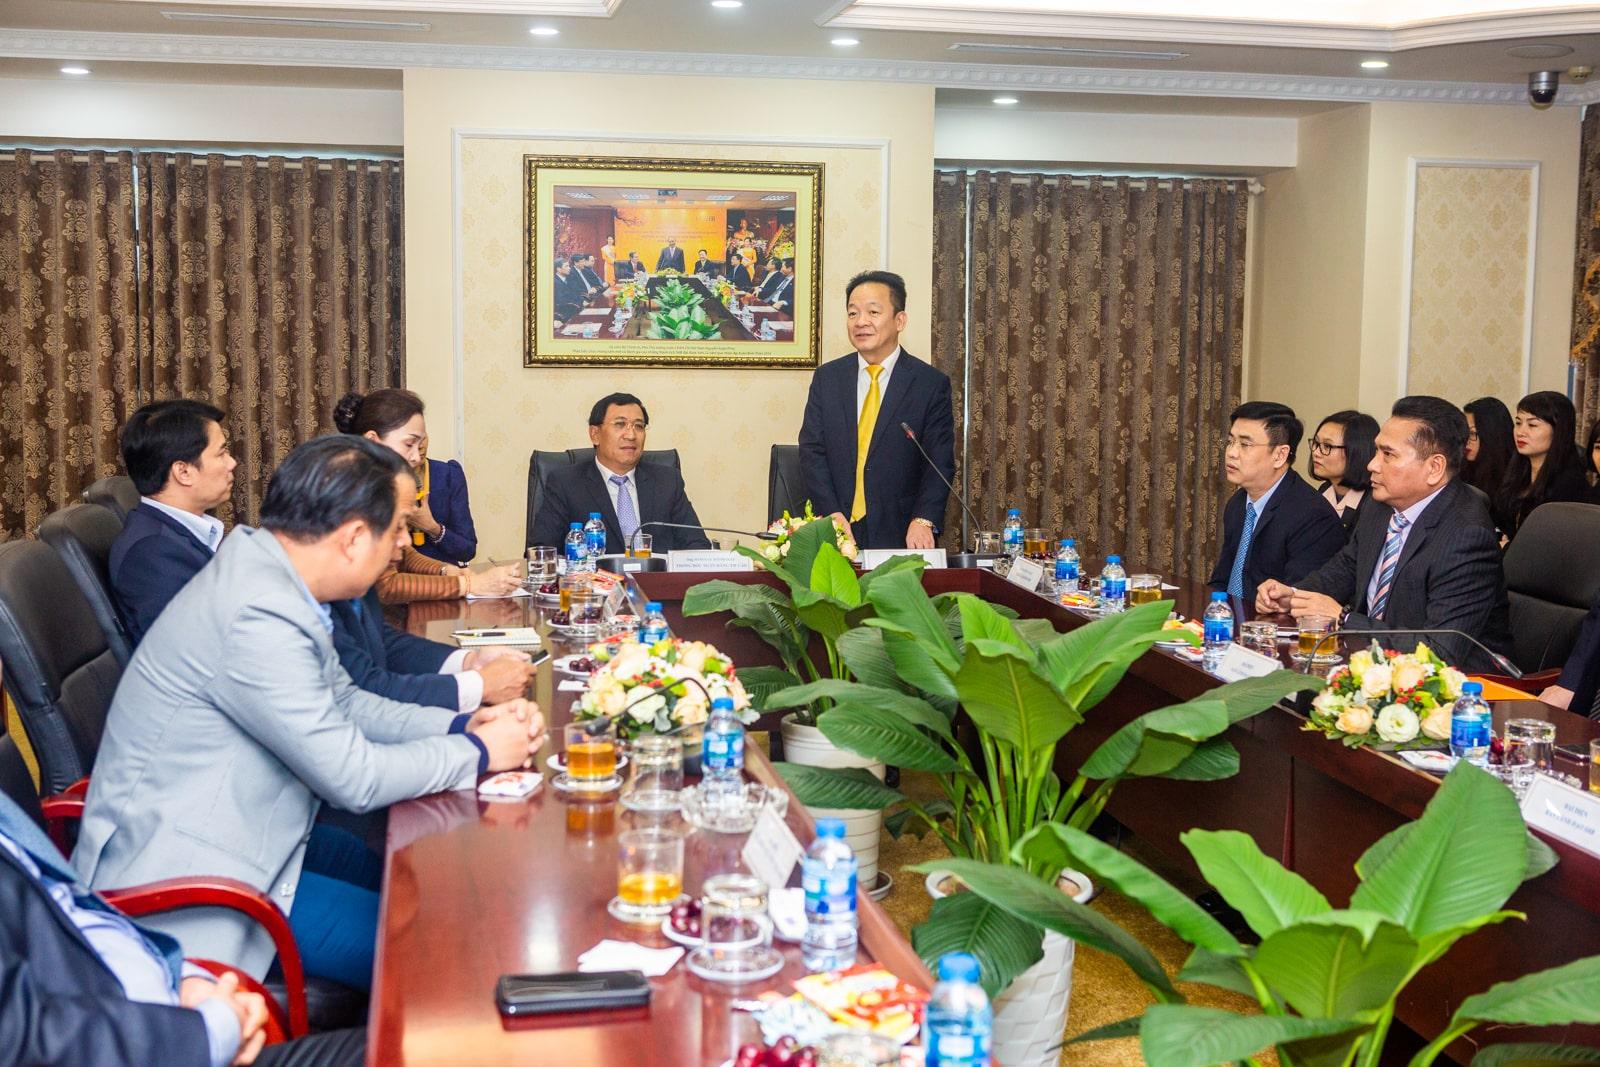 SHB Laos has an important contribution to the socio-economic development of Vietnam and Laos